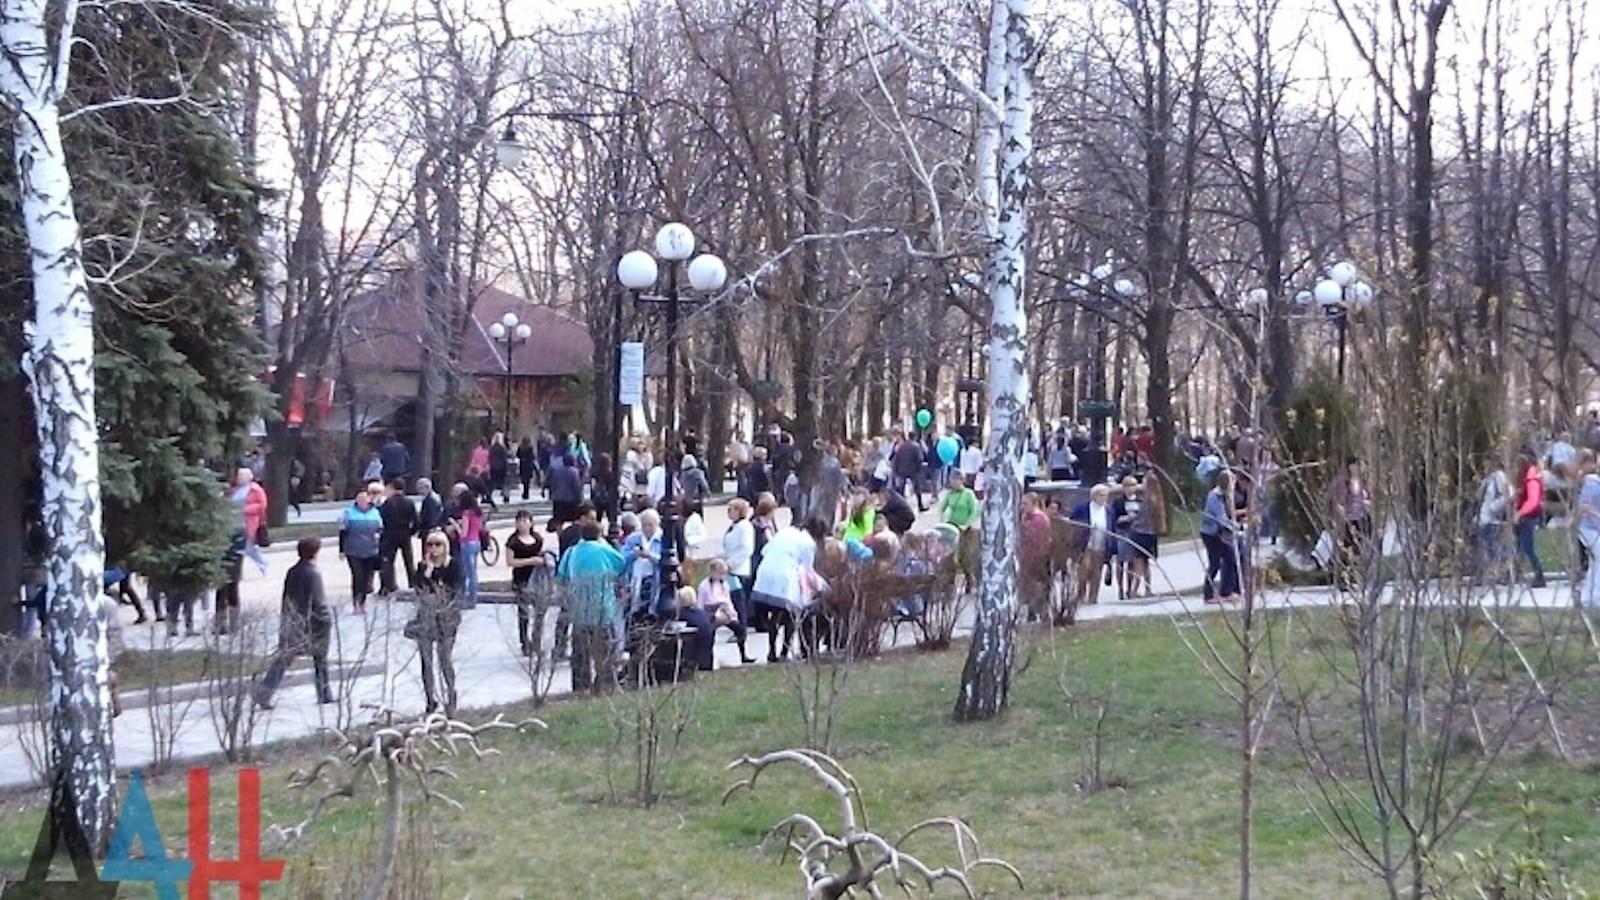 00 donetsk paskha 18. 12.04.15